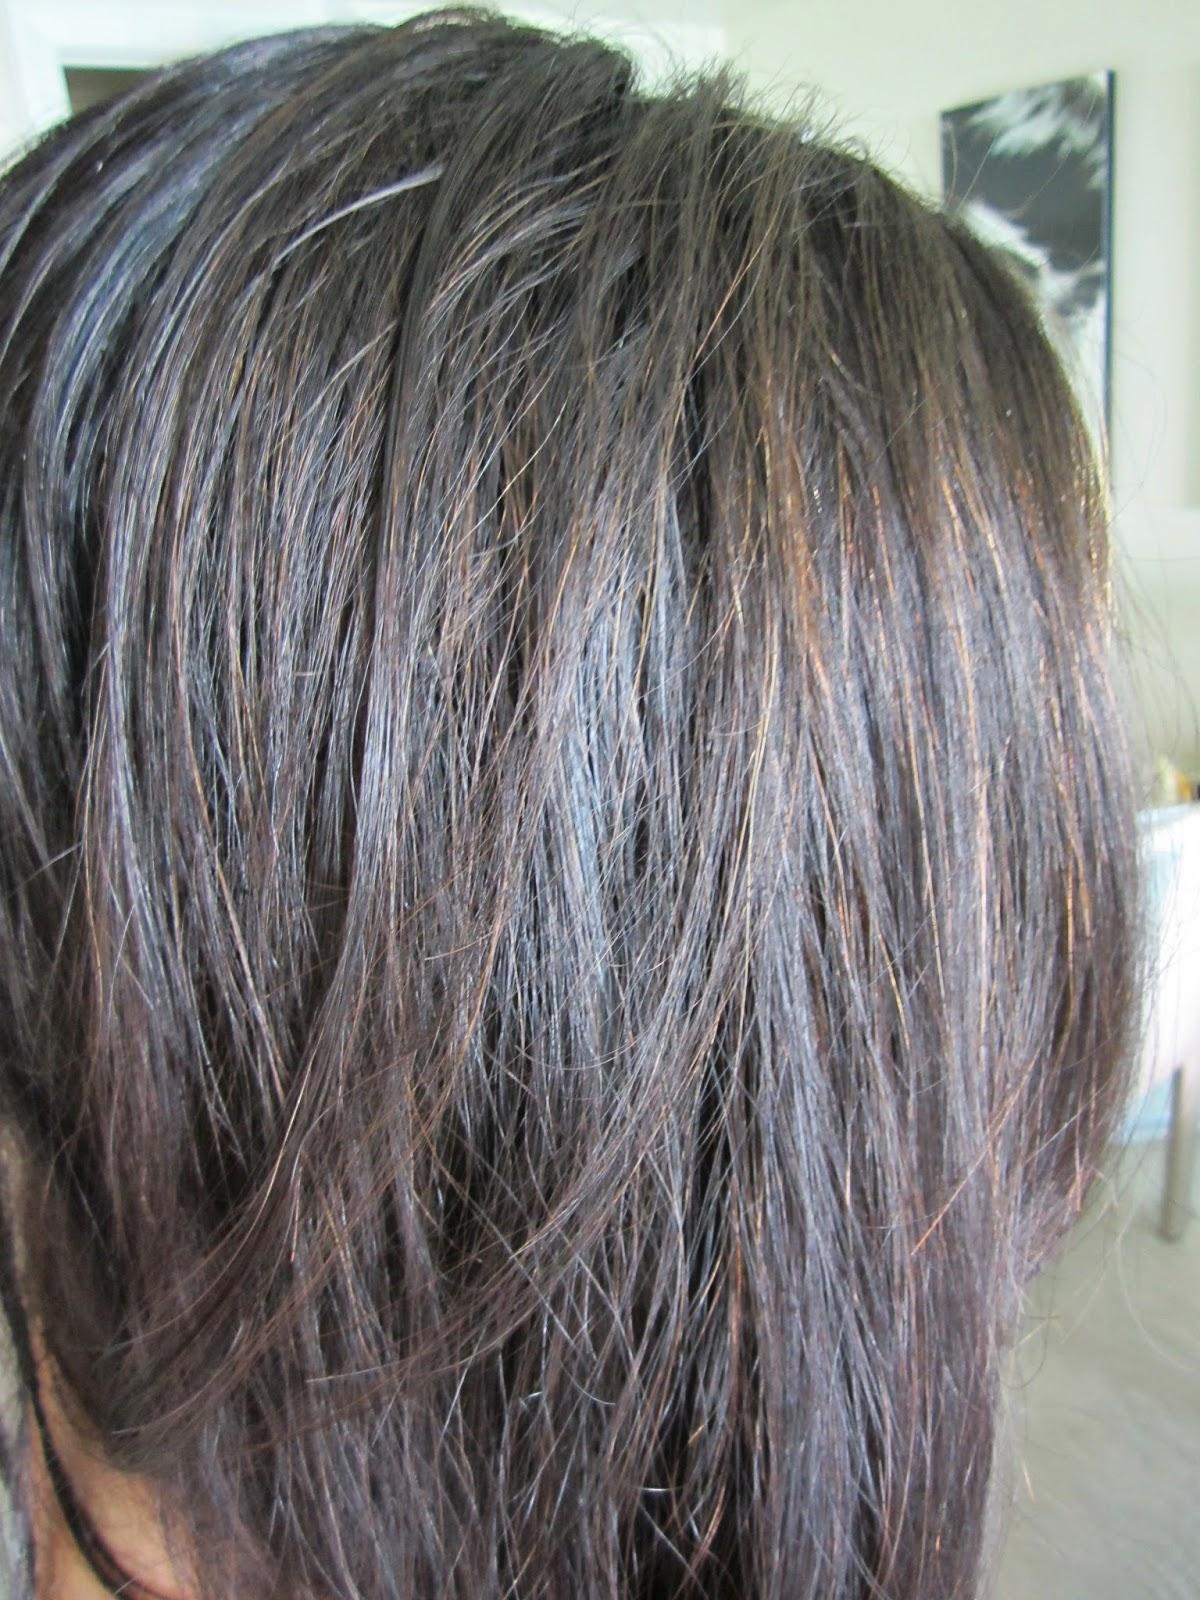 ... Revlon Frost & Glow Honey Highlighting Kit Review (On My Black Hair